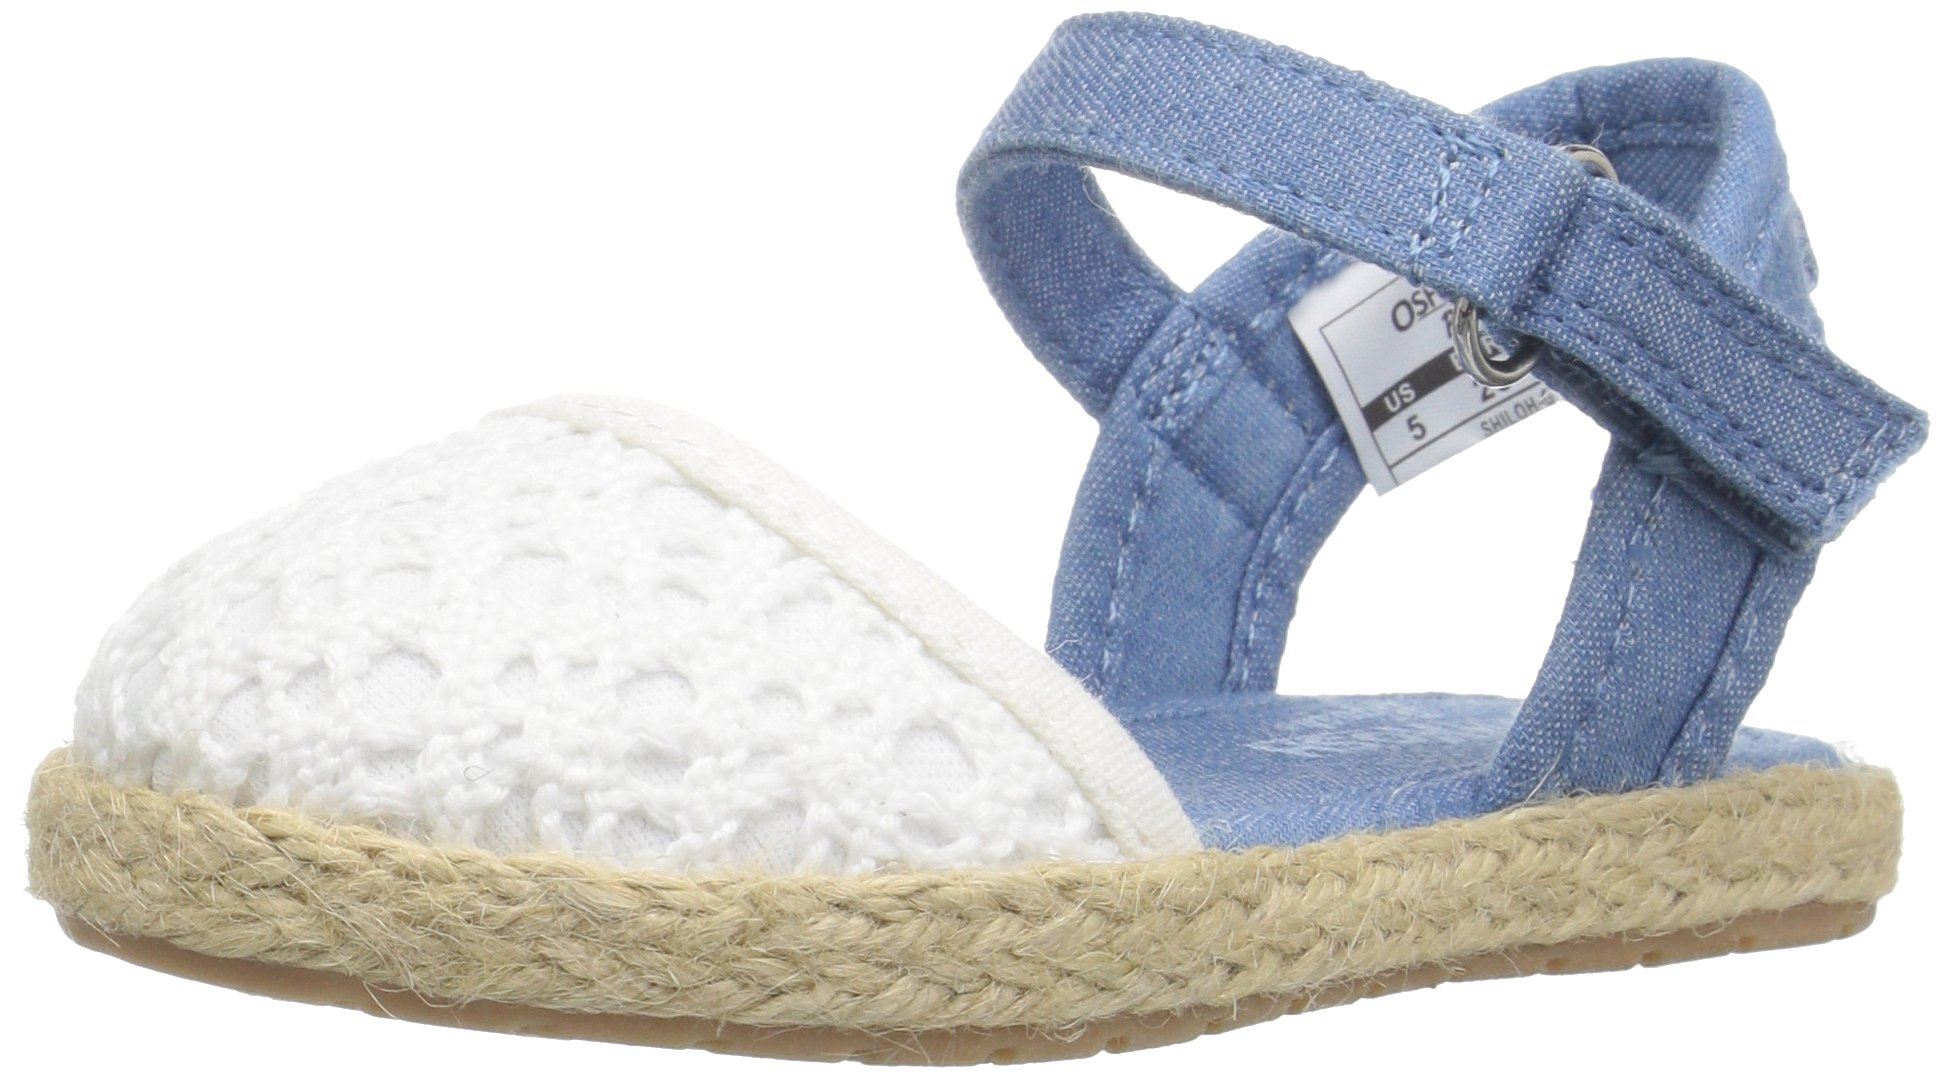 OshKosh BGosh Kids Georgette Girls Closed Toe Espadrille Sandal Mary Jane Flat